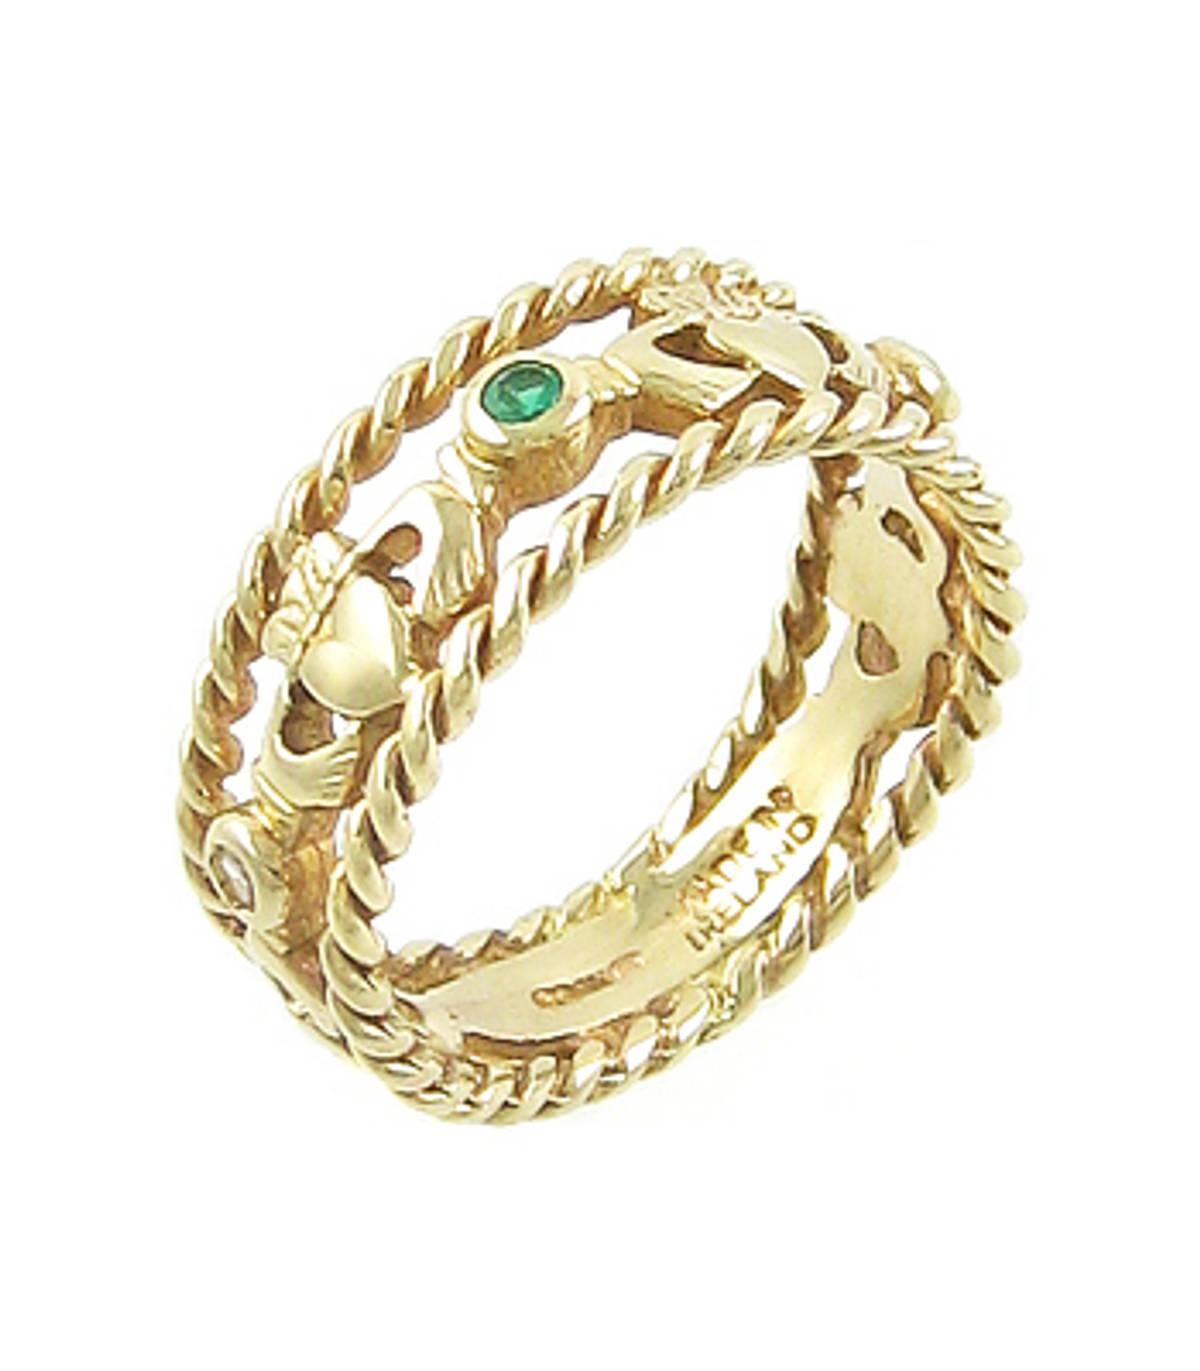 Irish made14 carat yellow gold 0.05cts emerald/0.04cts diamonds claddagh engagement ring